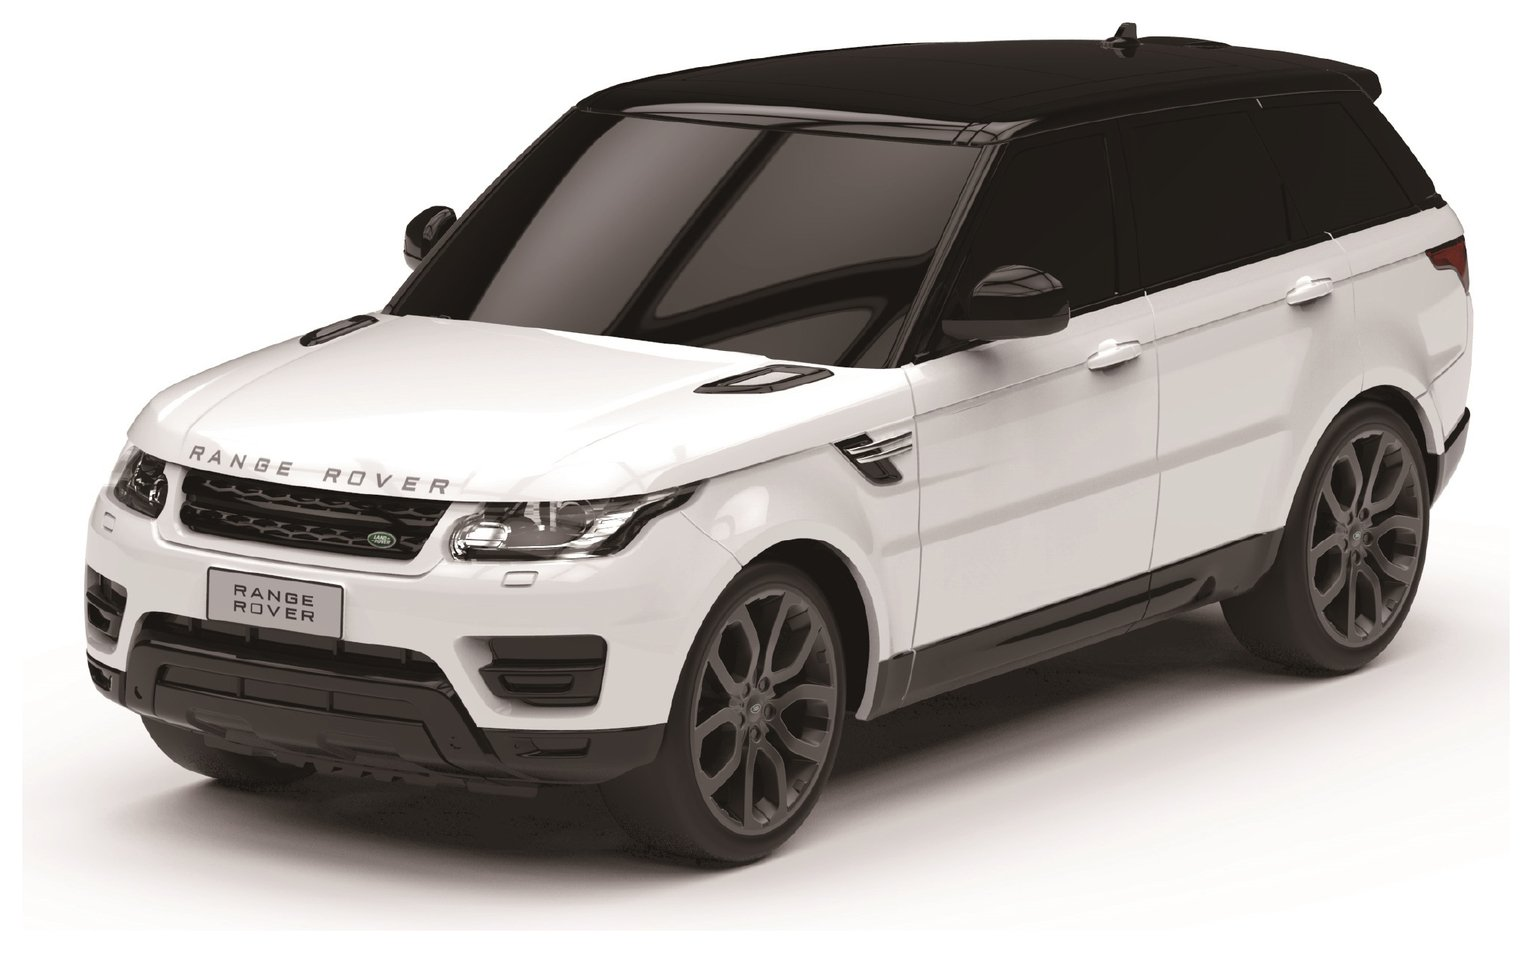 Range Rover Sport Remote Control Car 1:24 White 2.4Ghz